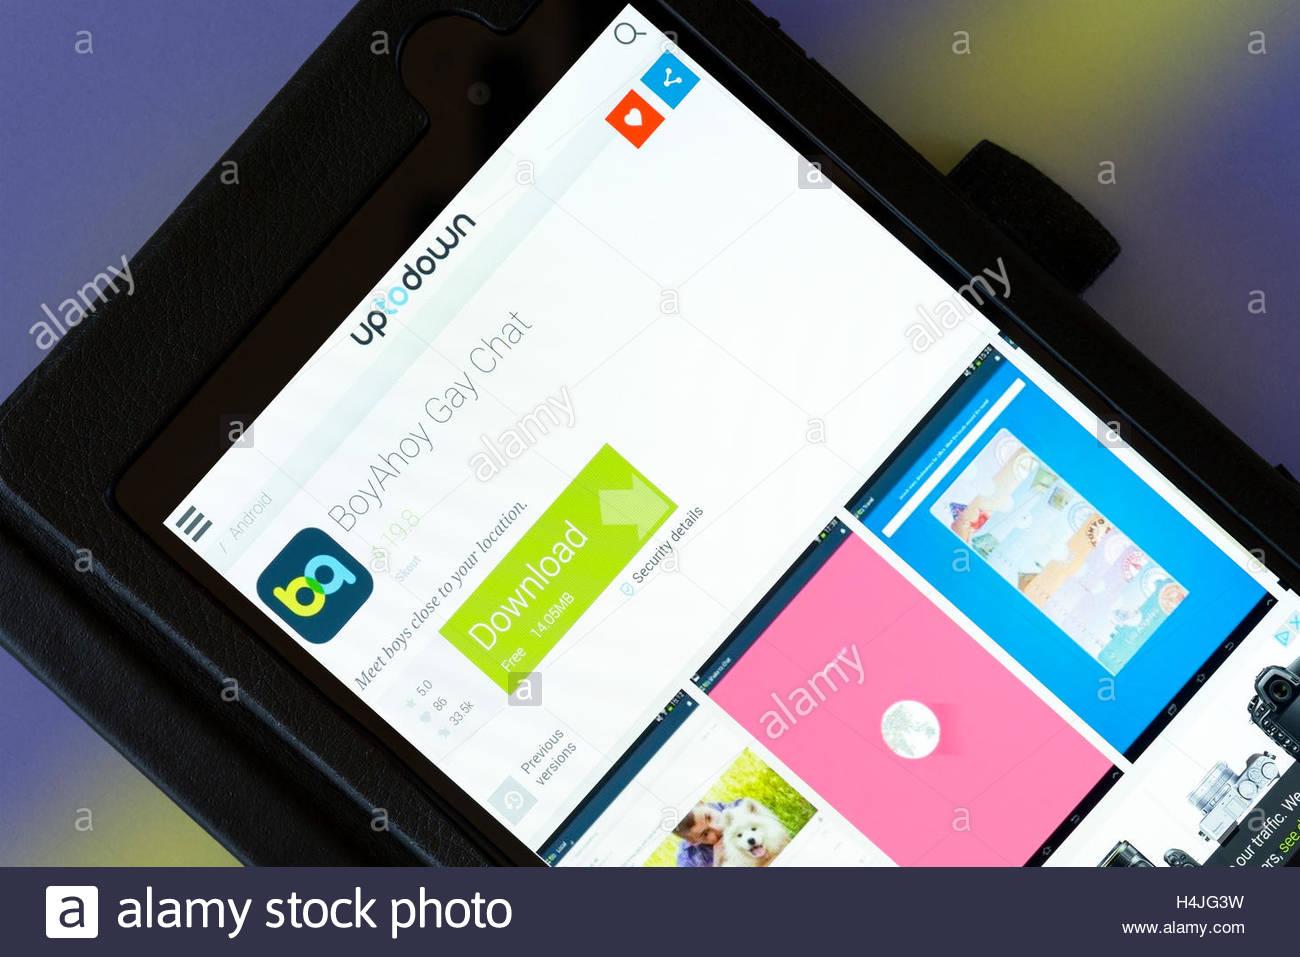 Gay dating apps för Android Albury Wodonga online dating